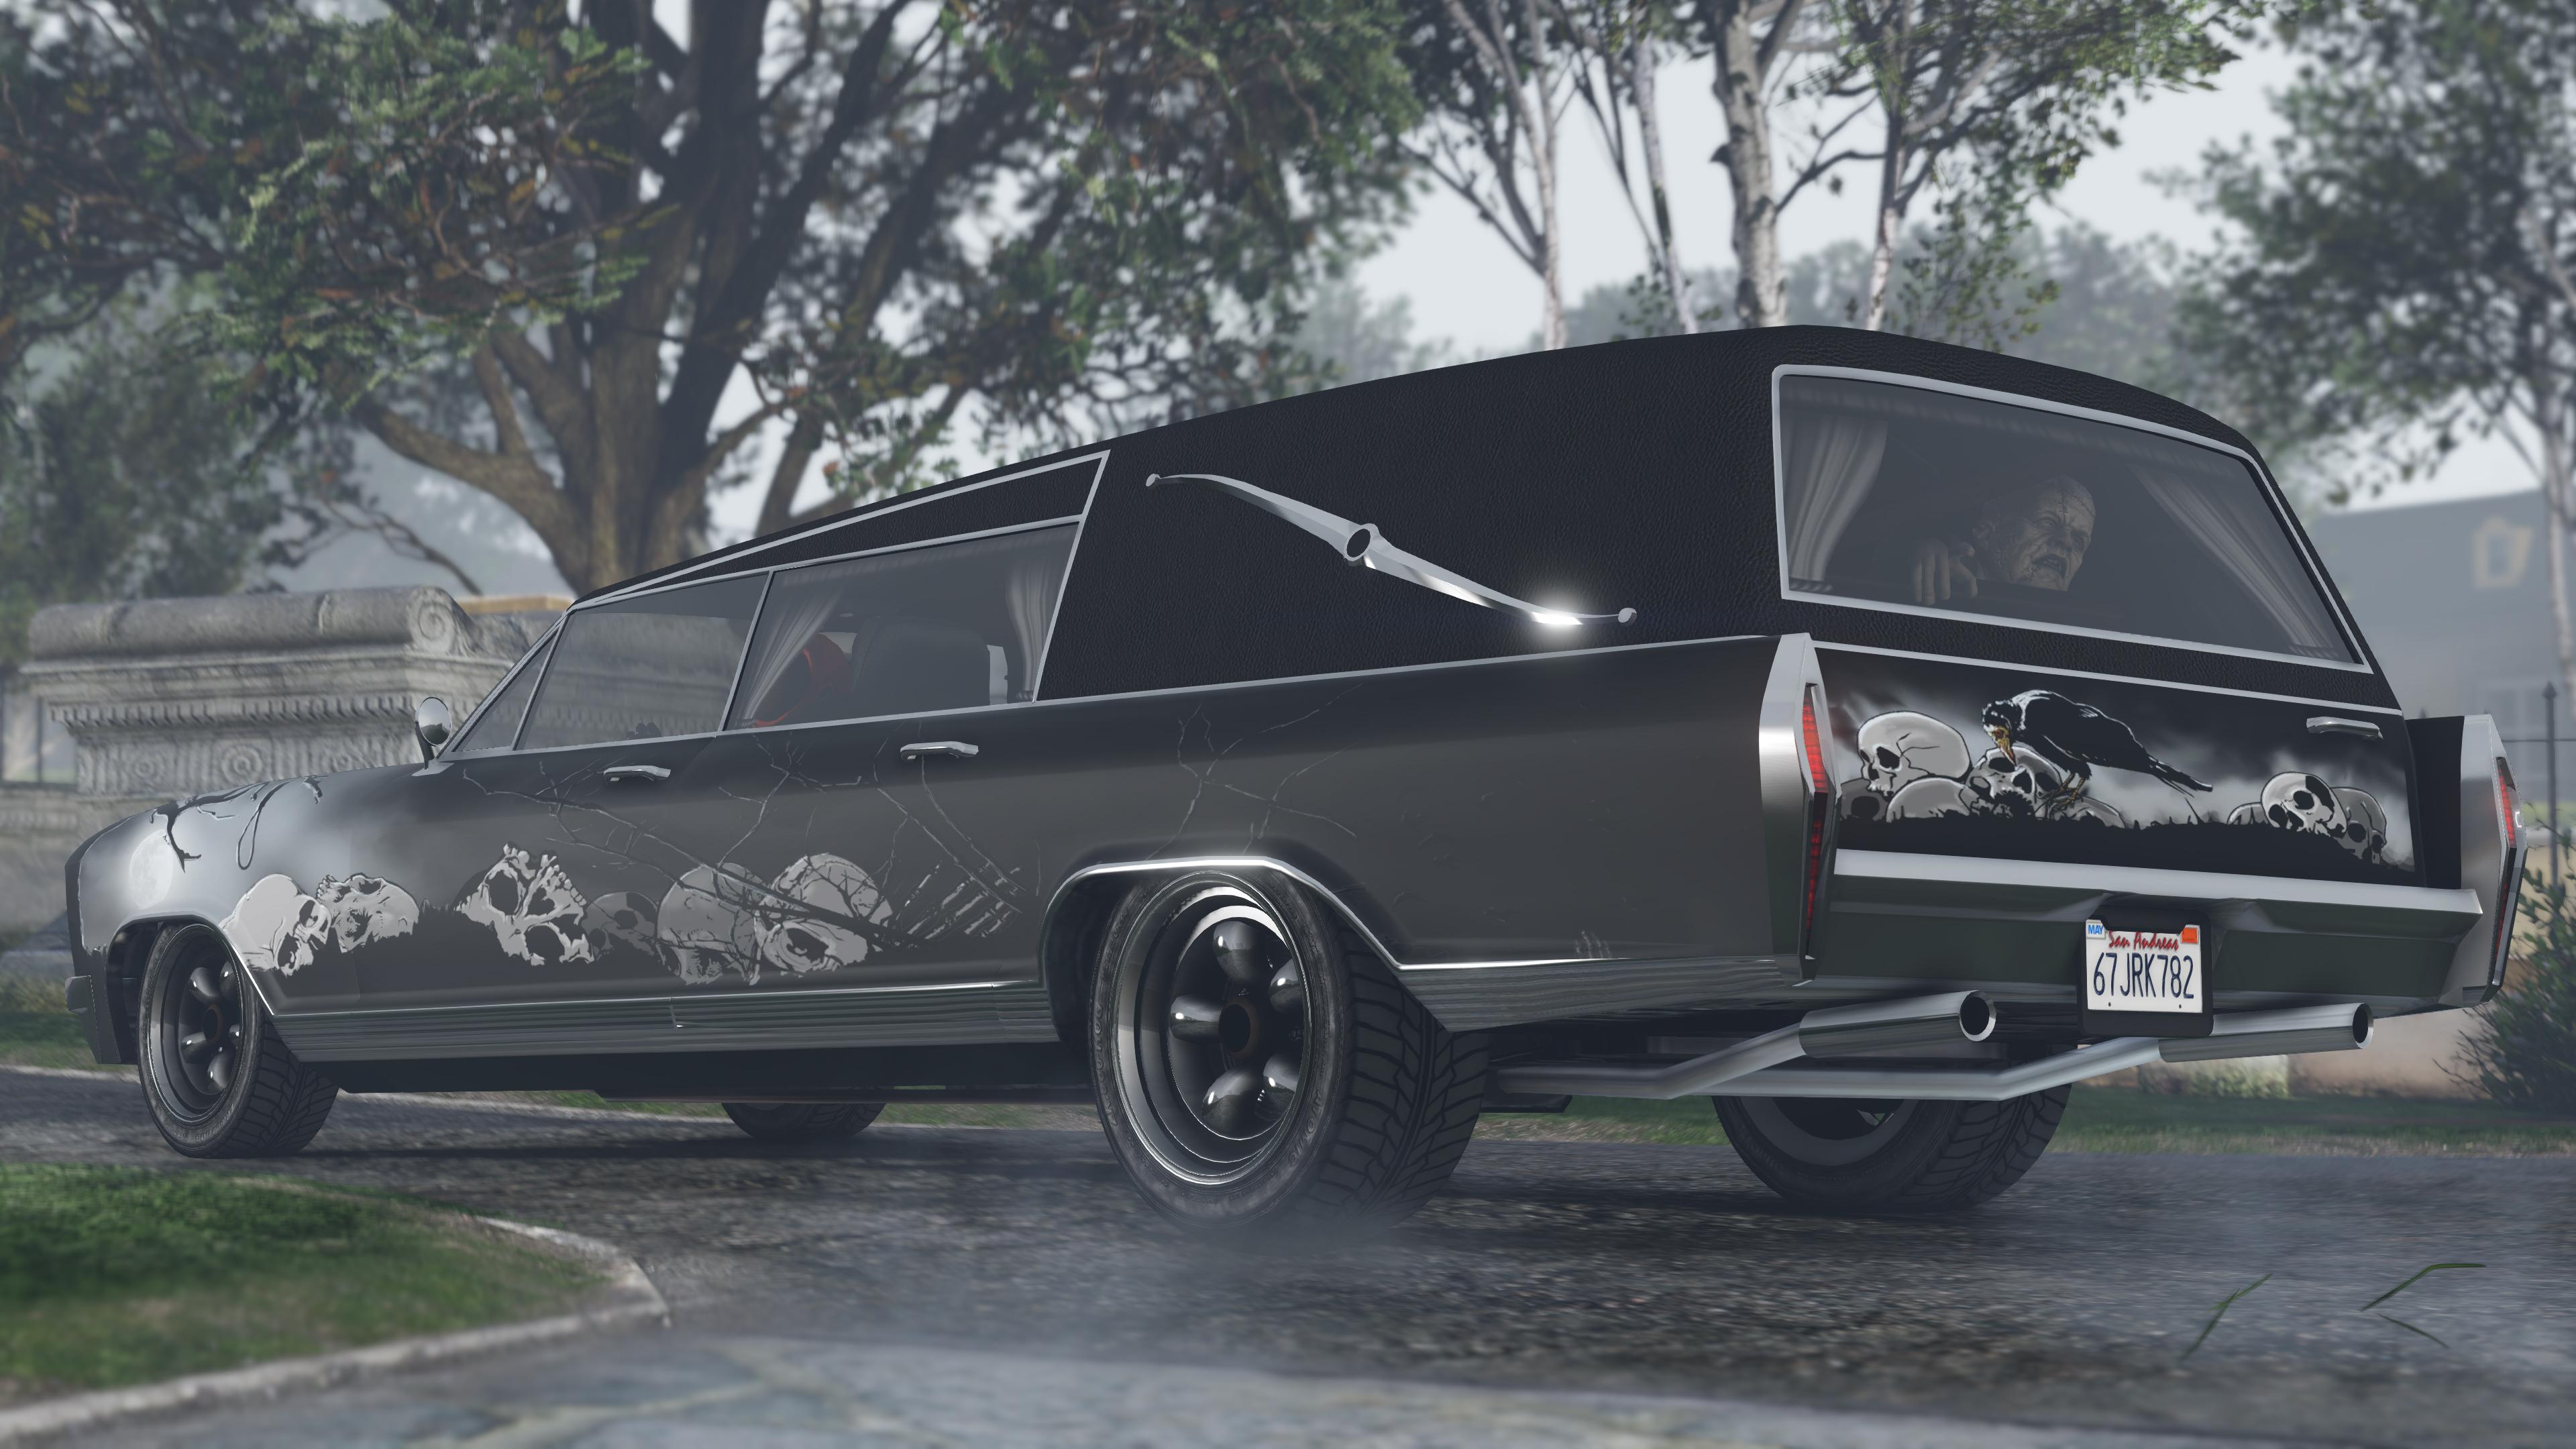 Gta V Halloween 2020 Items Grand Theft Auto Online: Halloween Surprise   Rockstar Games